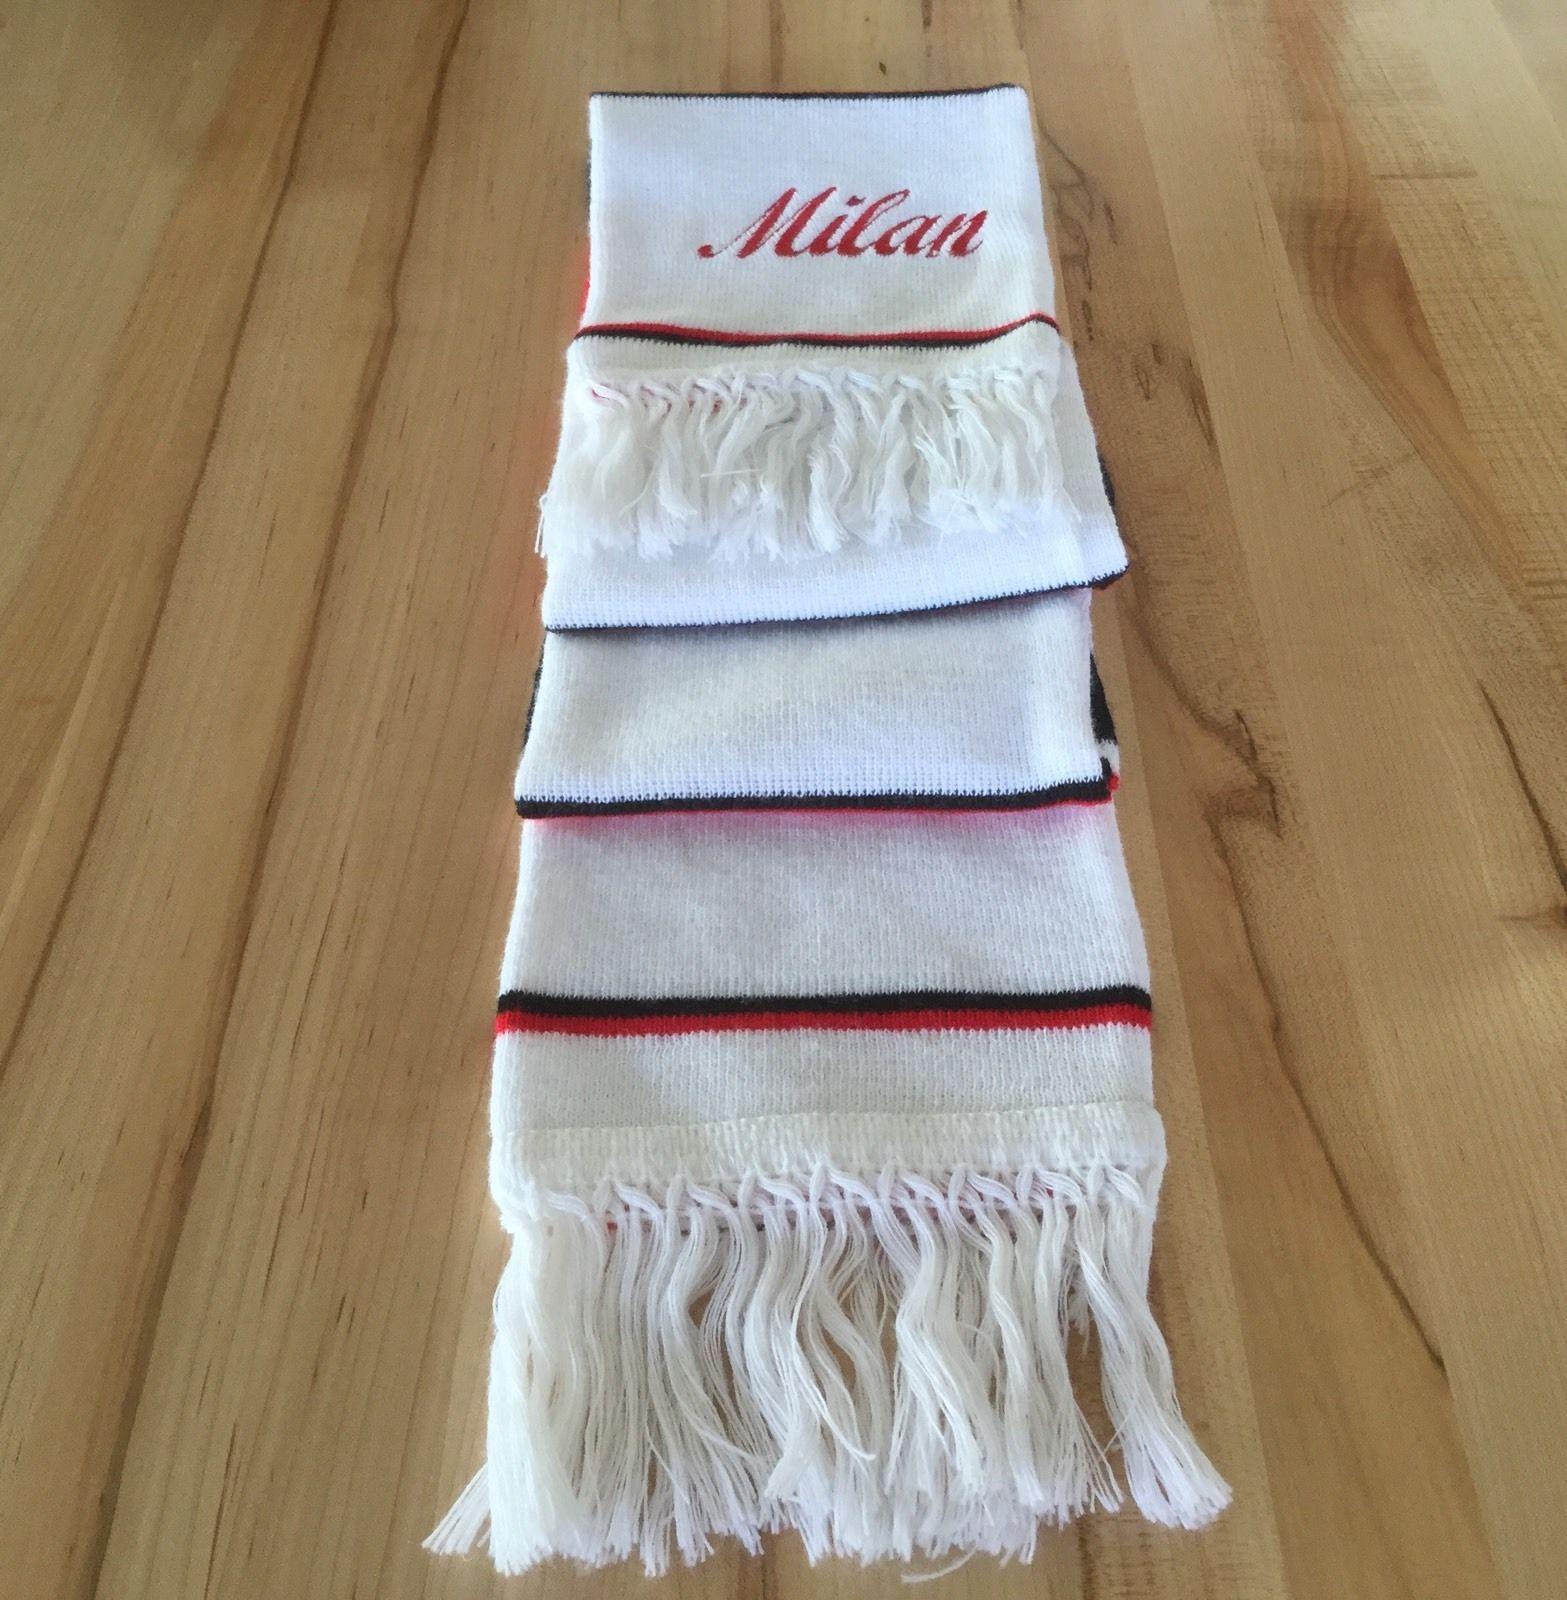 "Milan REVERSIBLE SCARF White / Red / Black 7""X 59"" Striped 100% Acrylic"